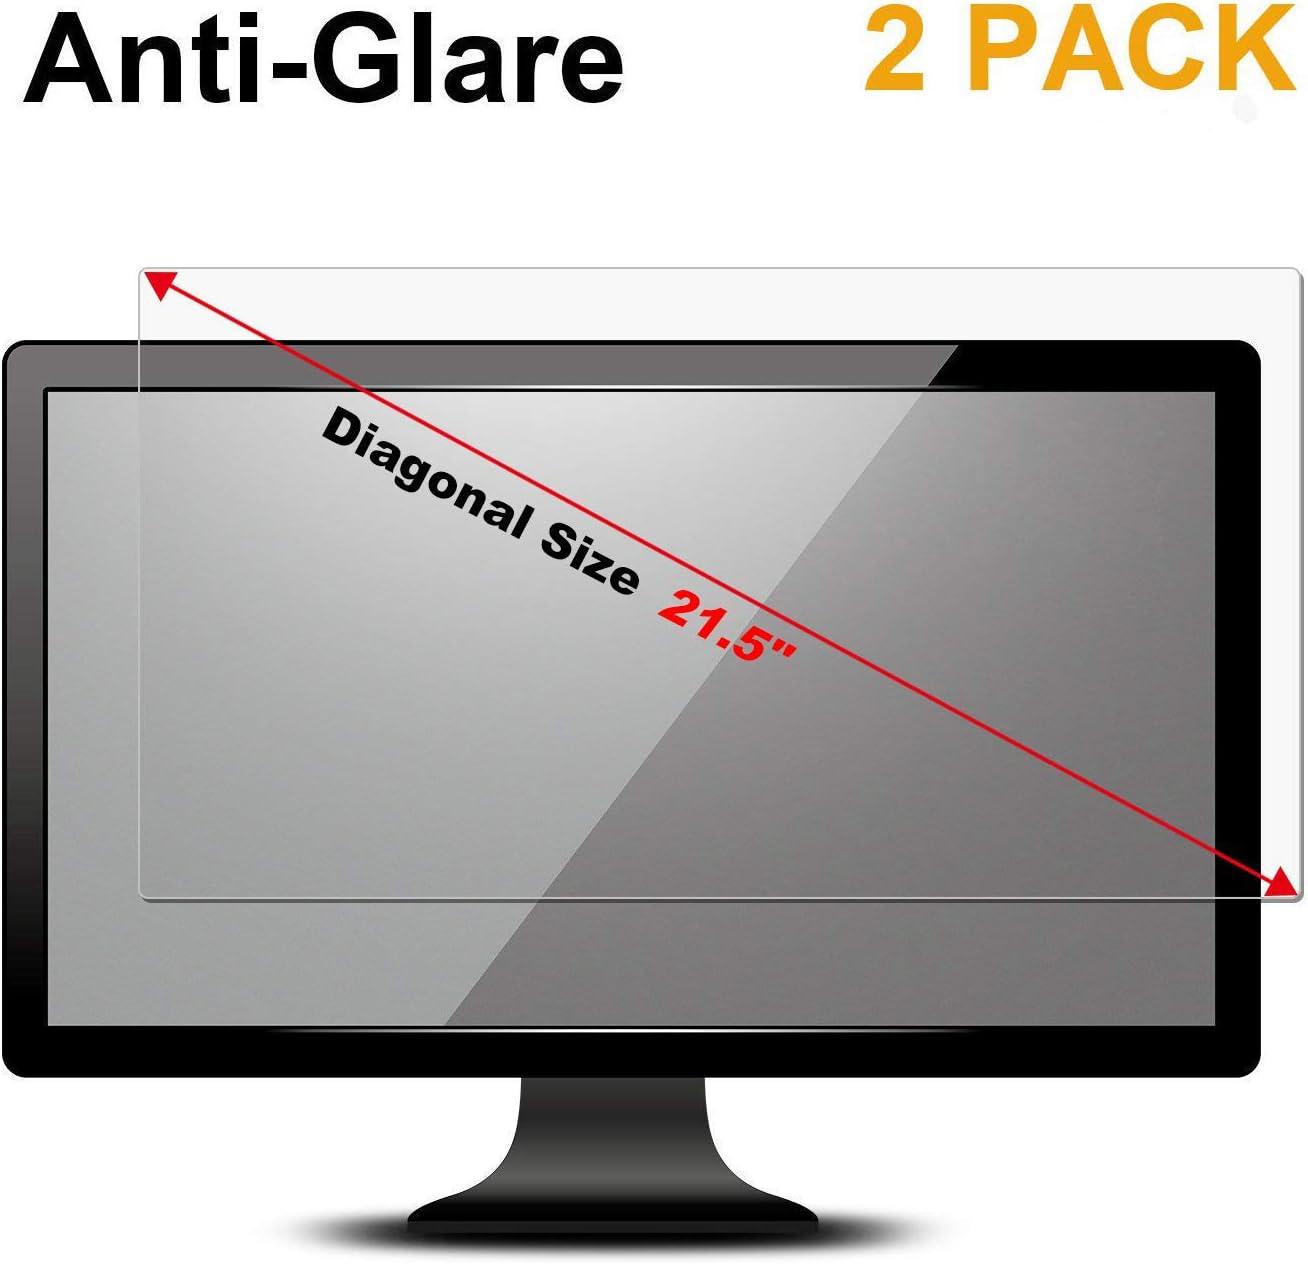 Protector de pantalla Anti Glare 21.5 pulgadas 16:9